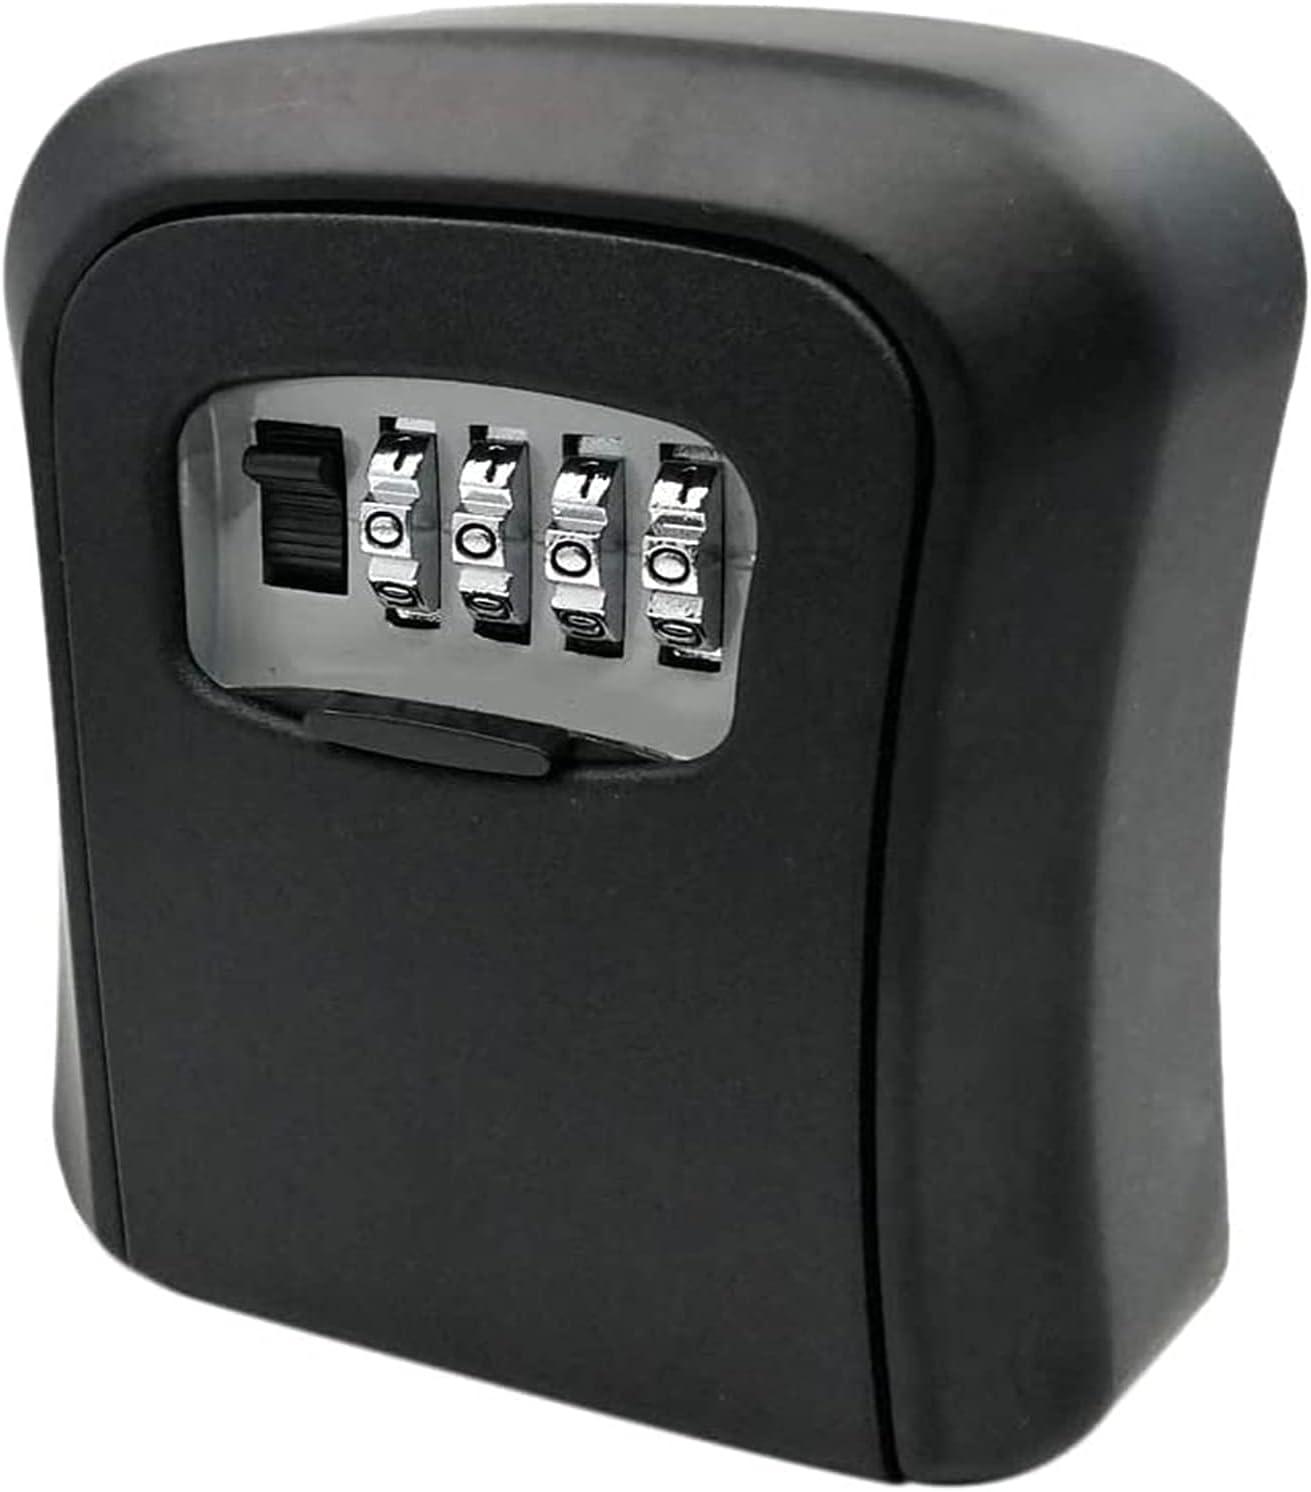 LIBAI Kamenda Boston Mall Key Max 60% OFF Safe Wall Mounting Password Lock Box